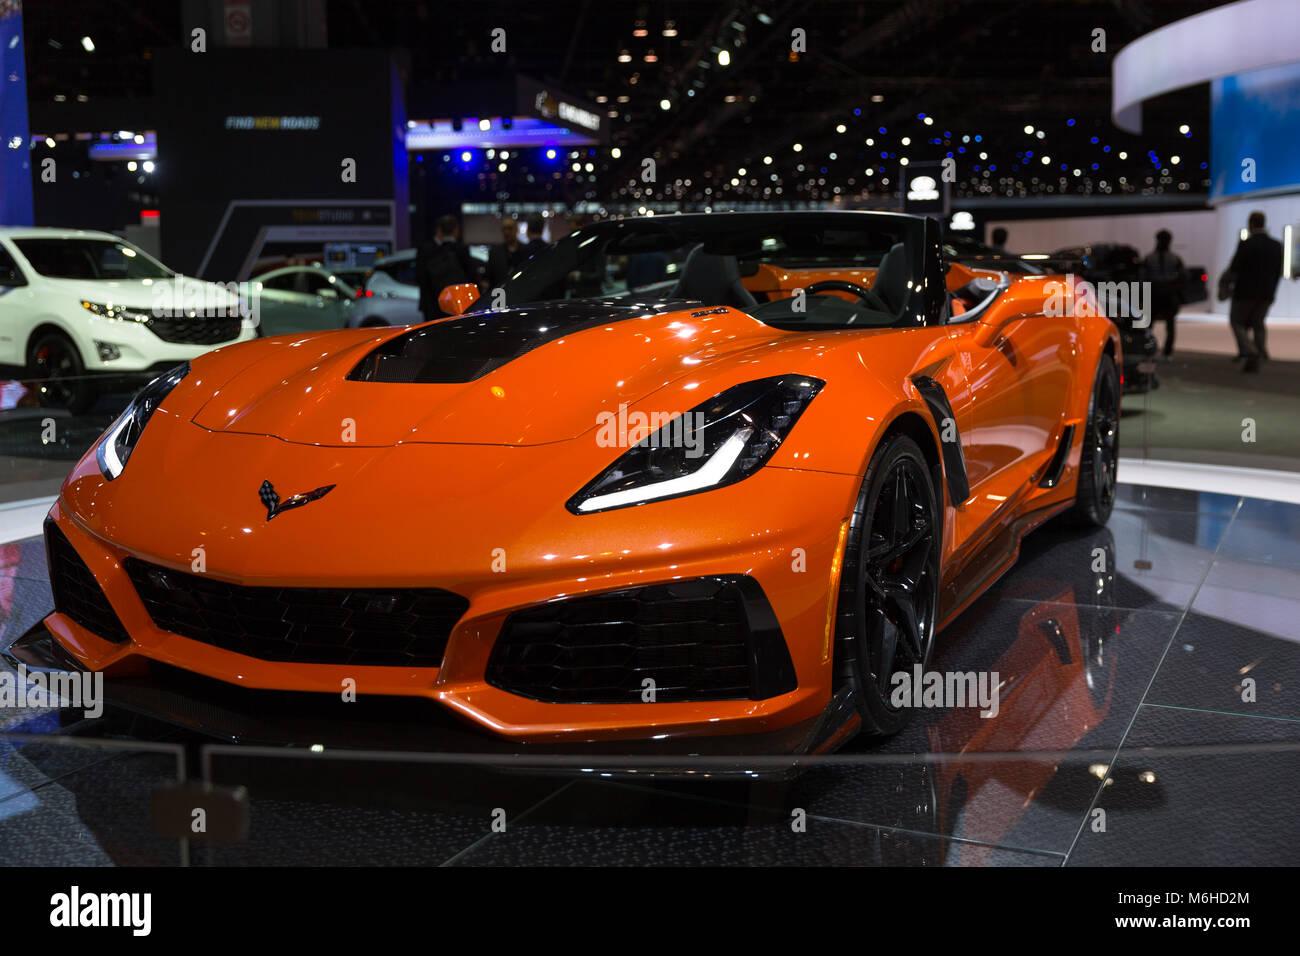 2019 Chevrolet Corvette Zr11 At The 2018 Chicago Auto Show Stock